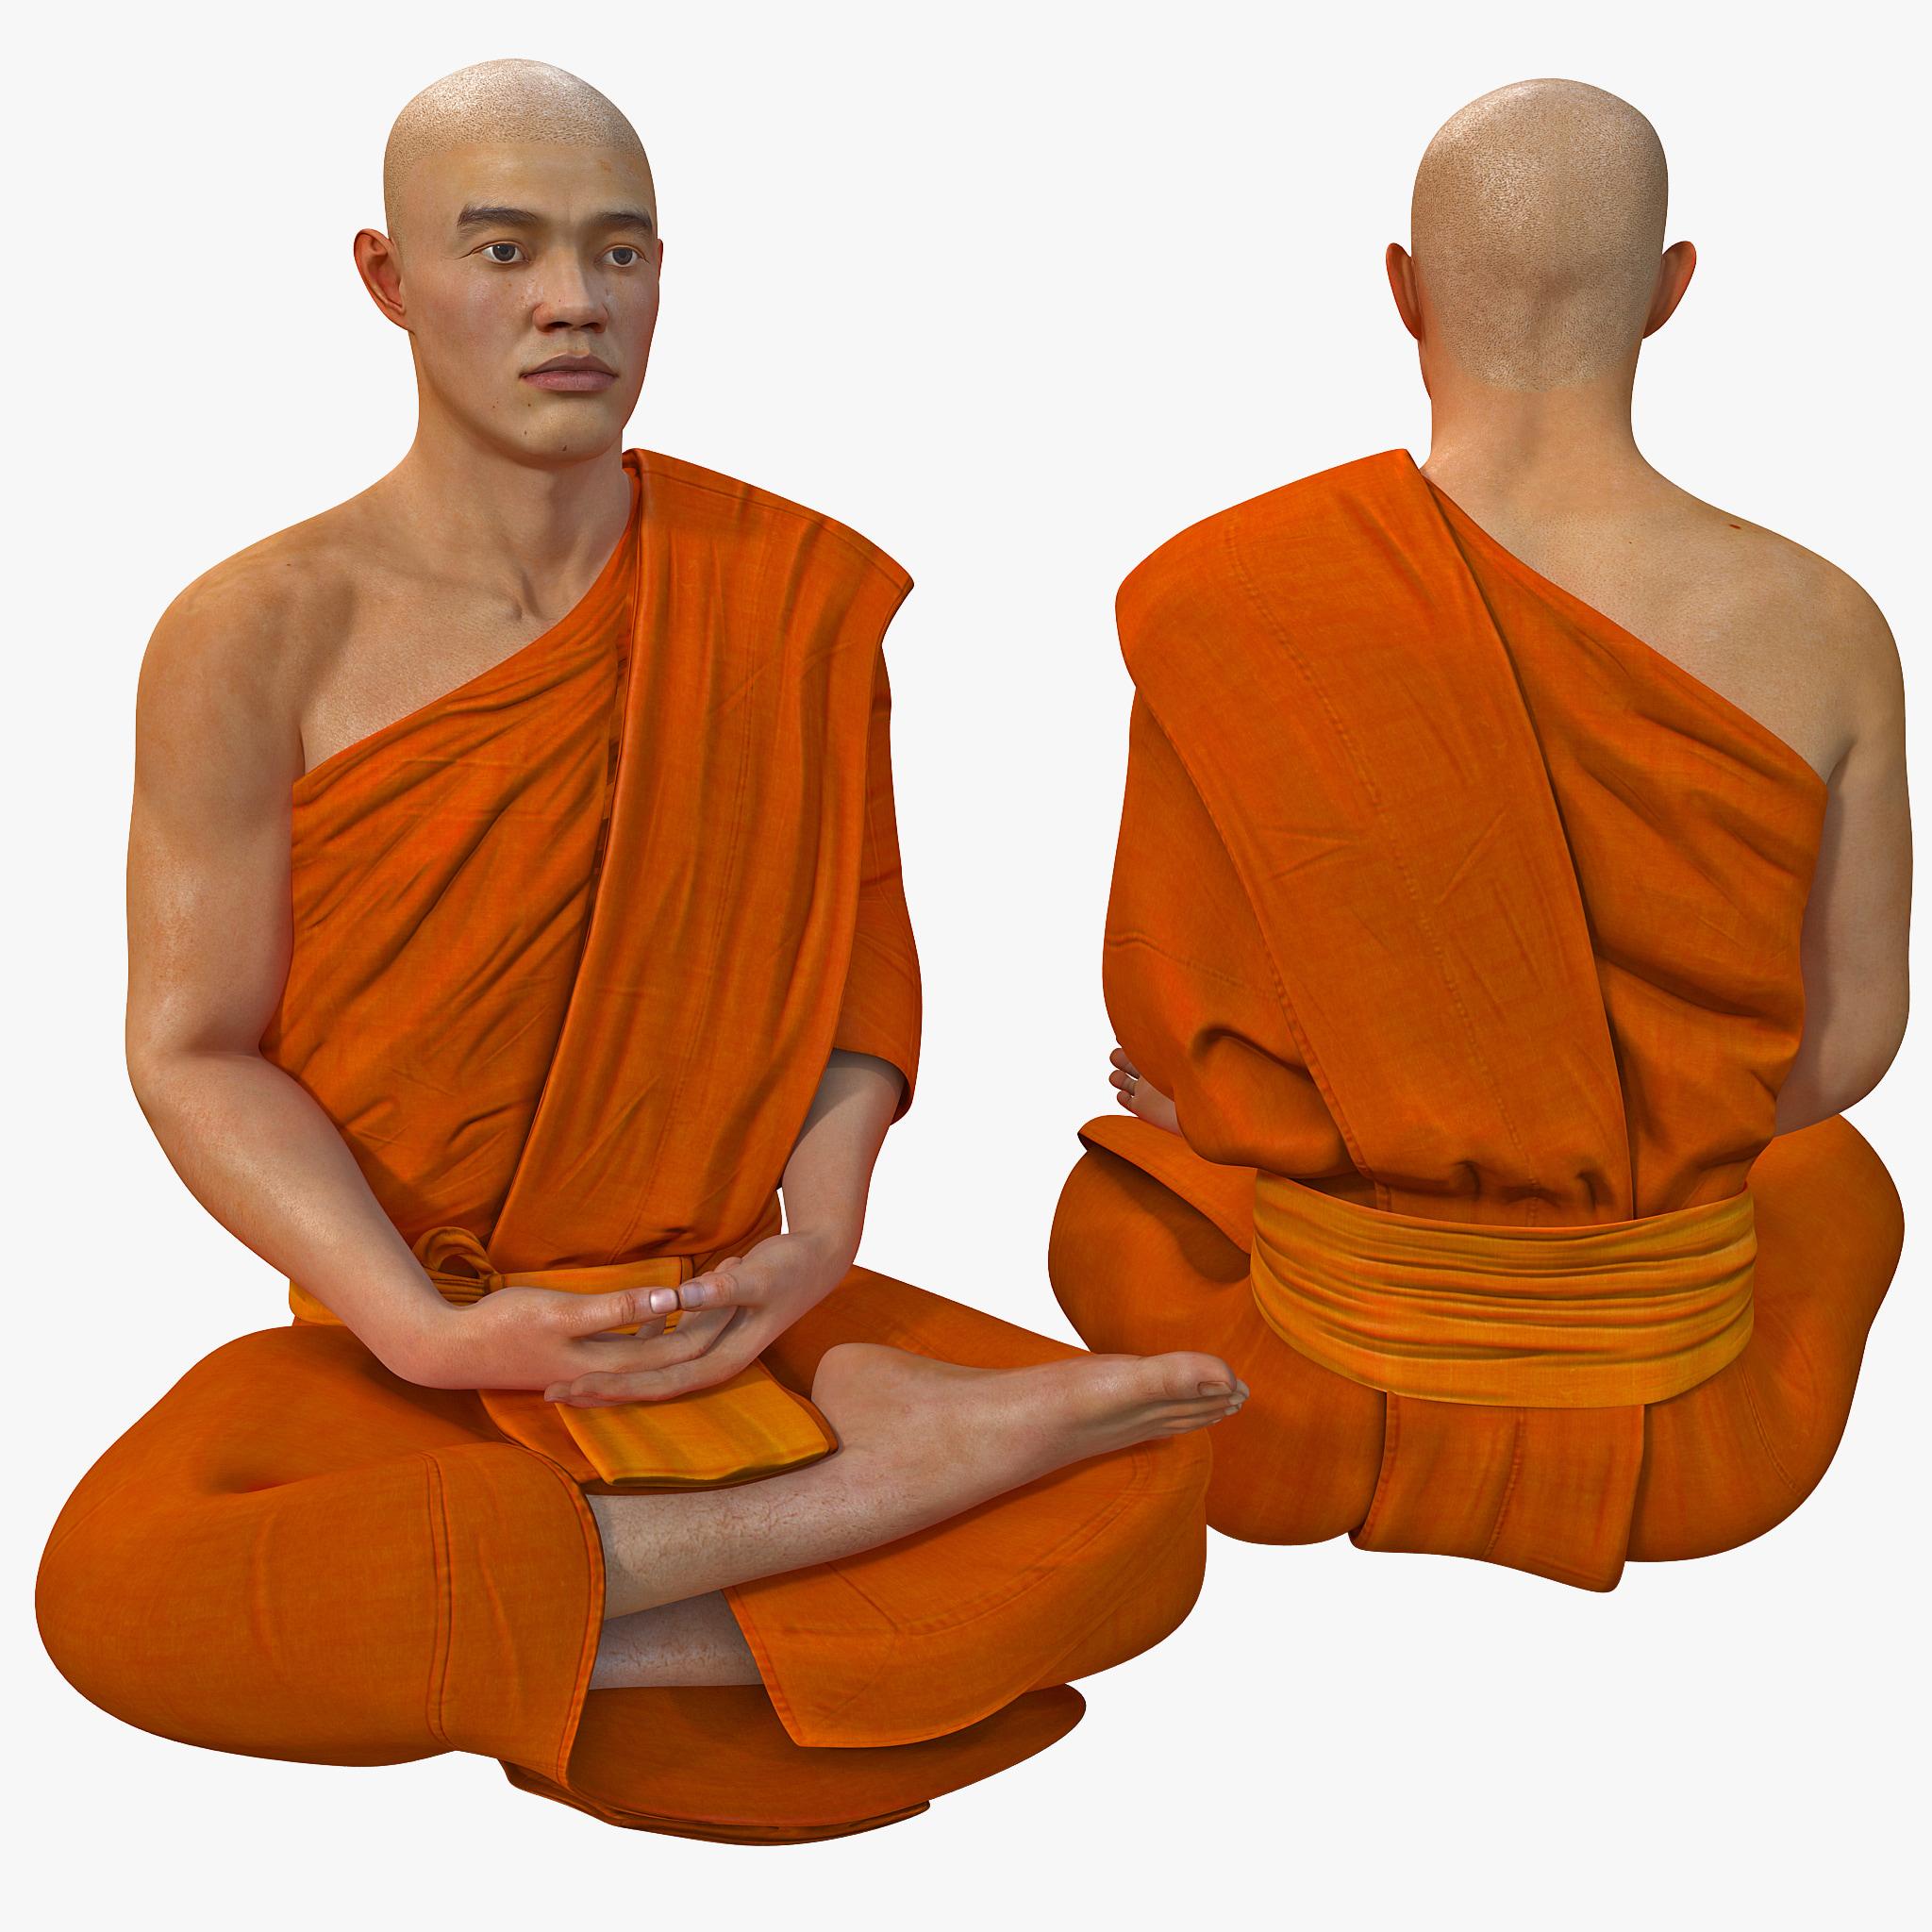 Buddhist Monk Seated Meditation Pose_1.jpg